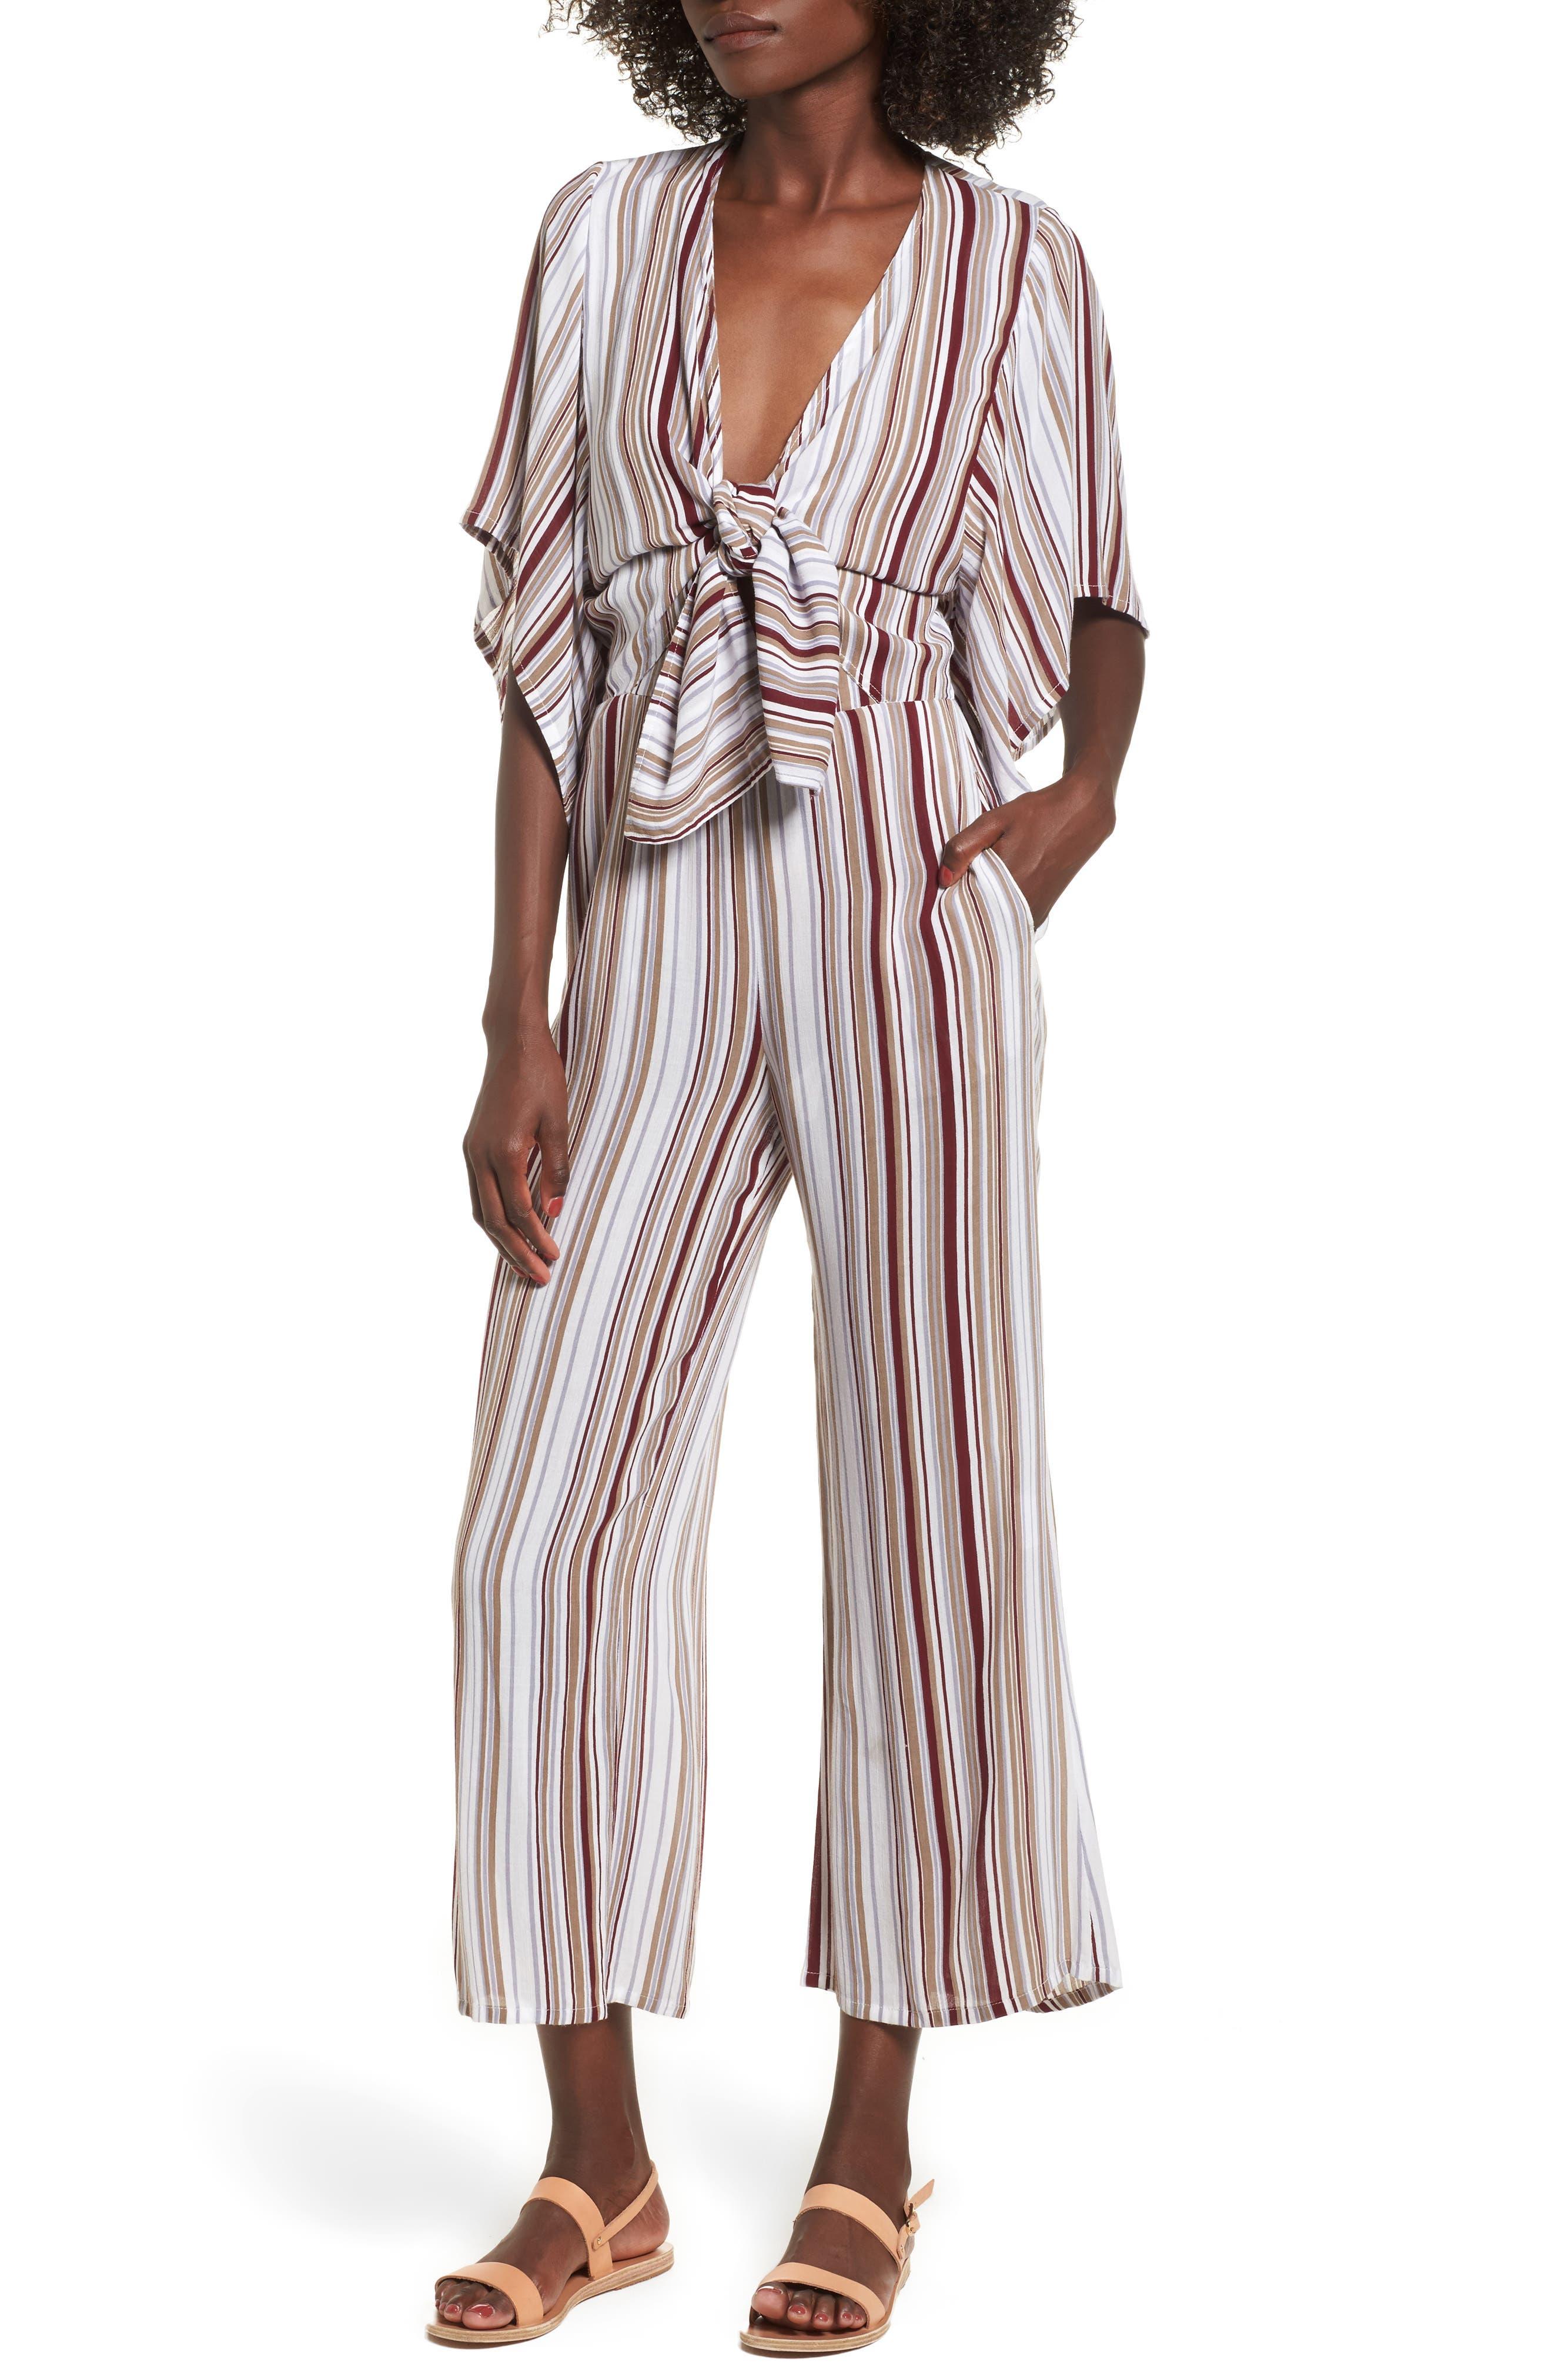 Main Image - FAITHFULL THE BRAND Tilos Stripe Knotted Jumpsuit